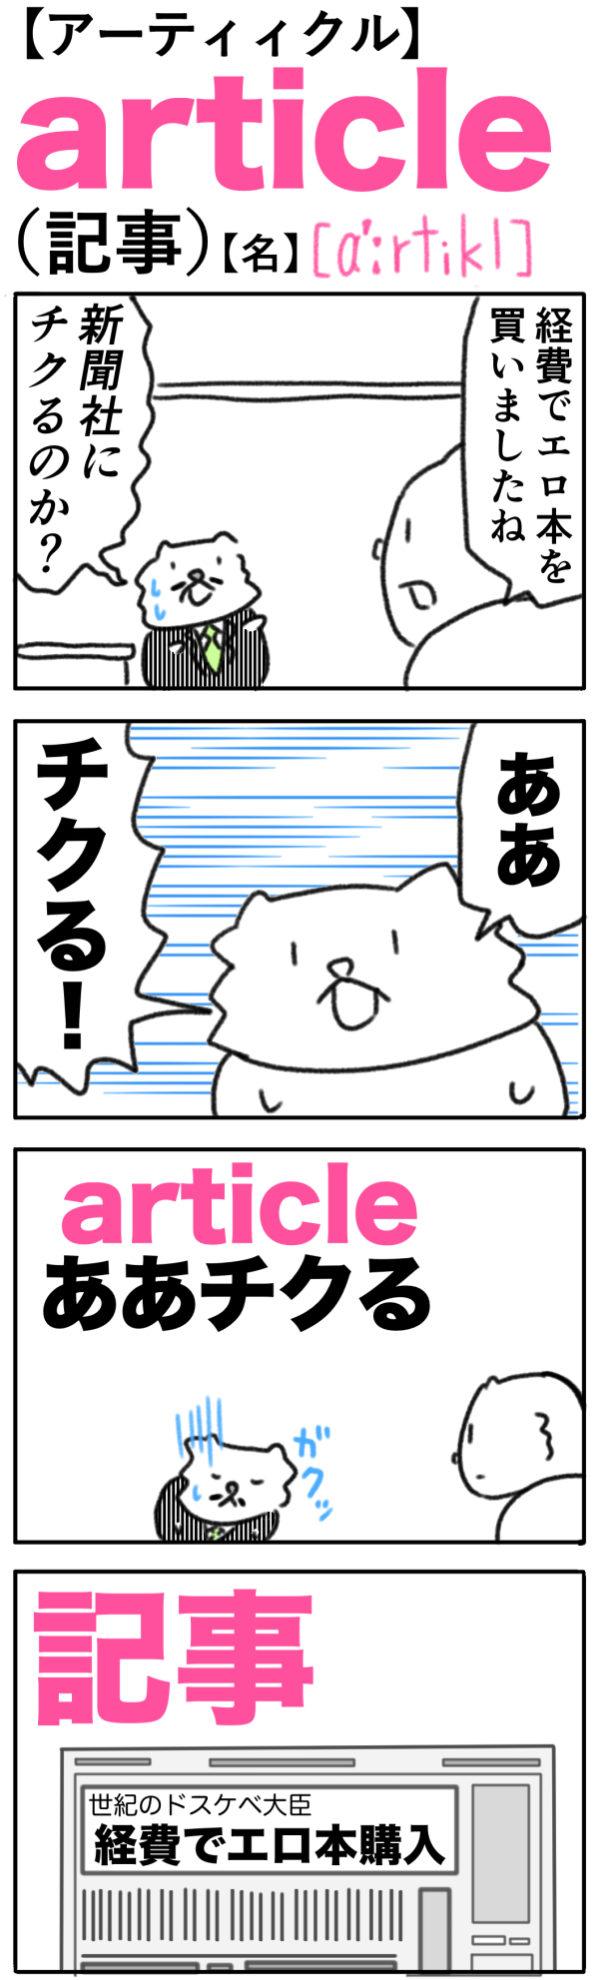 article(記事)の語呂合わせ英単語